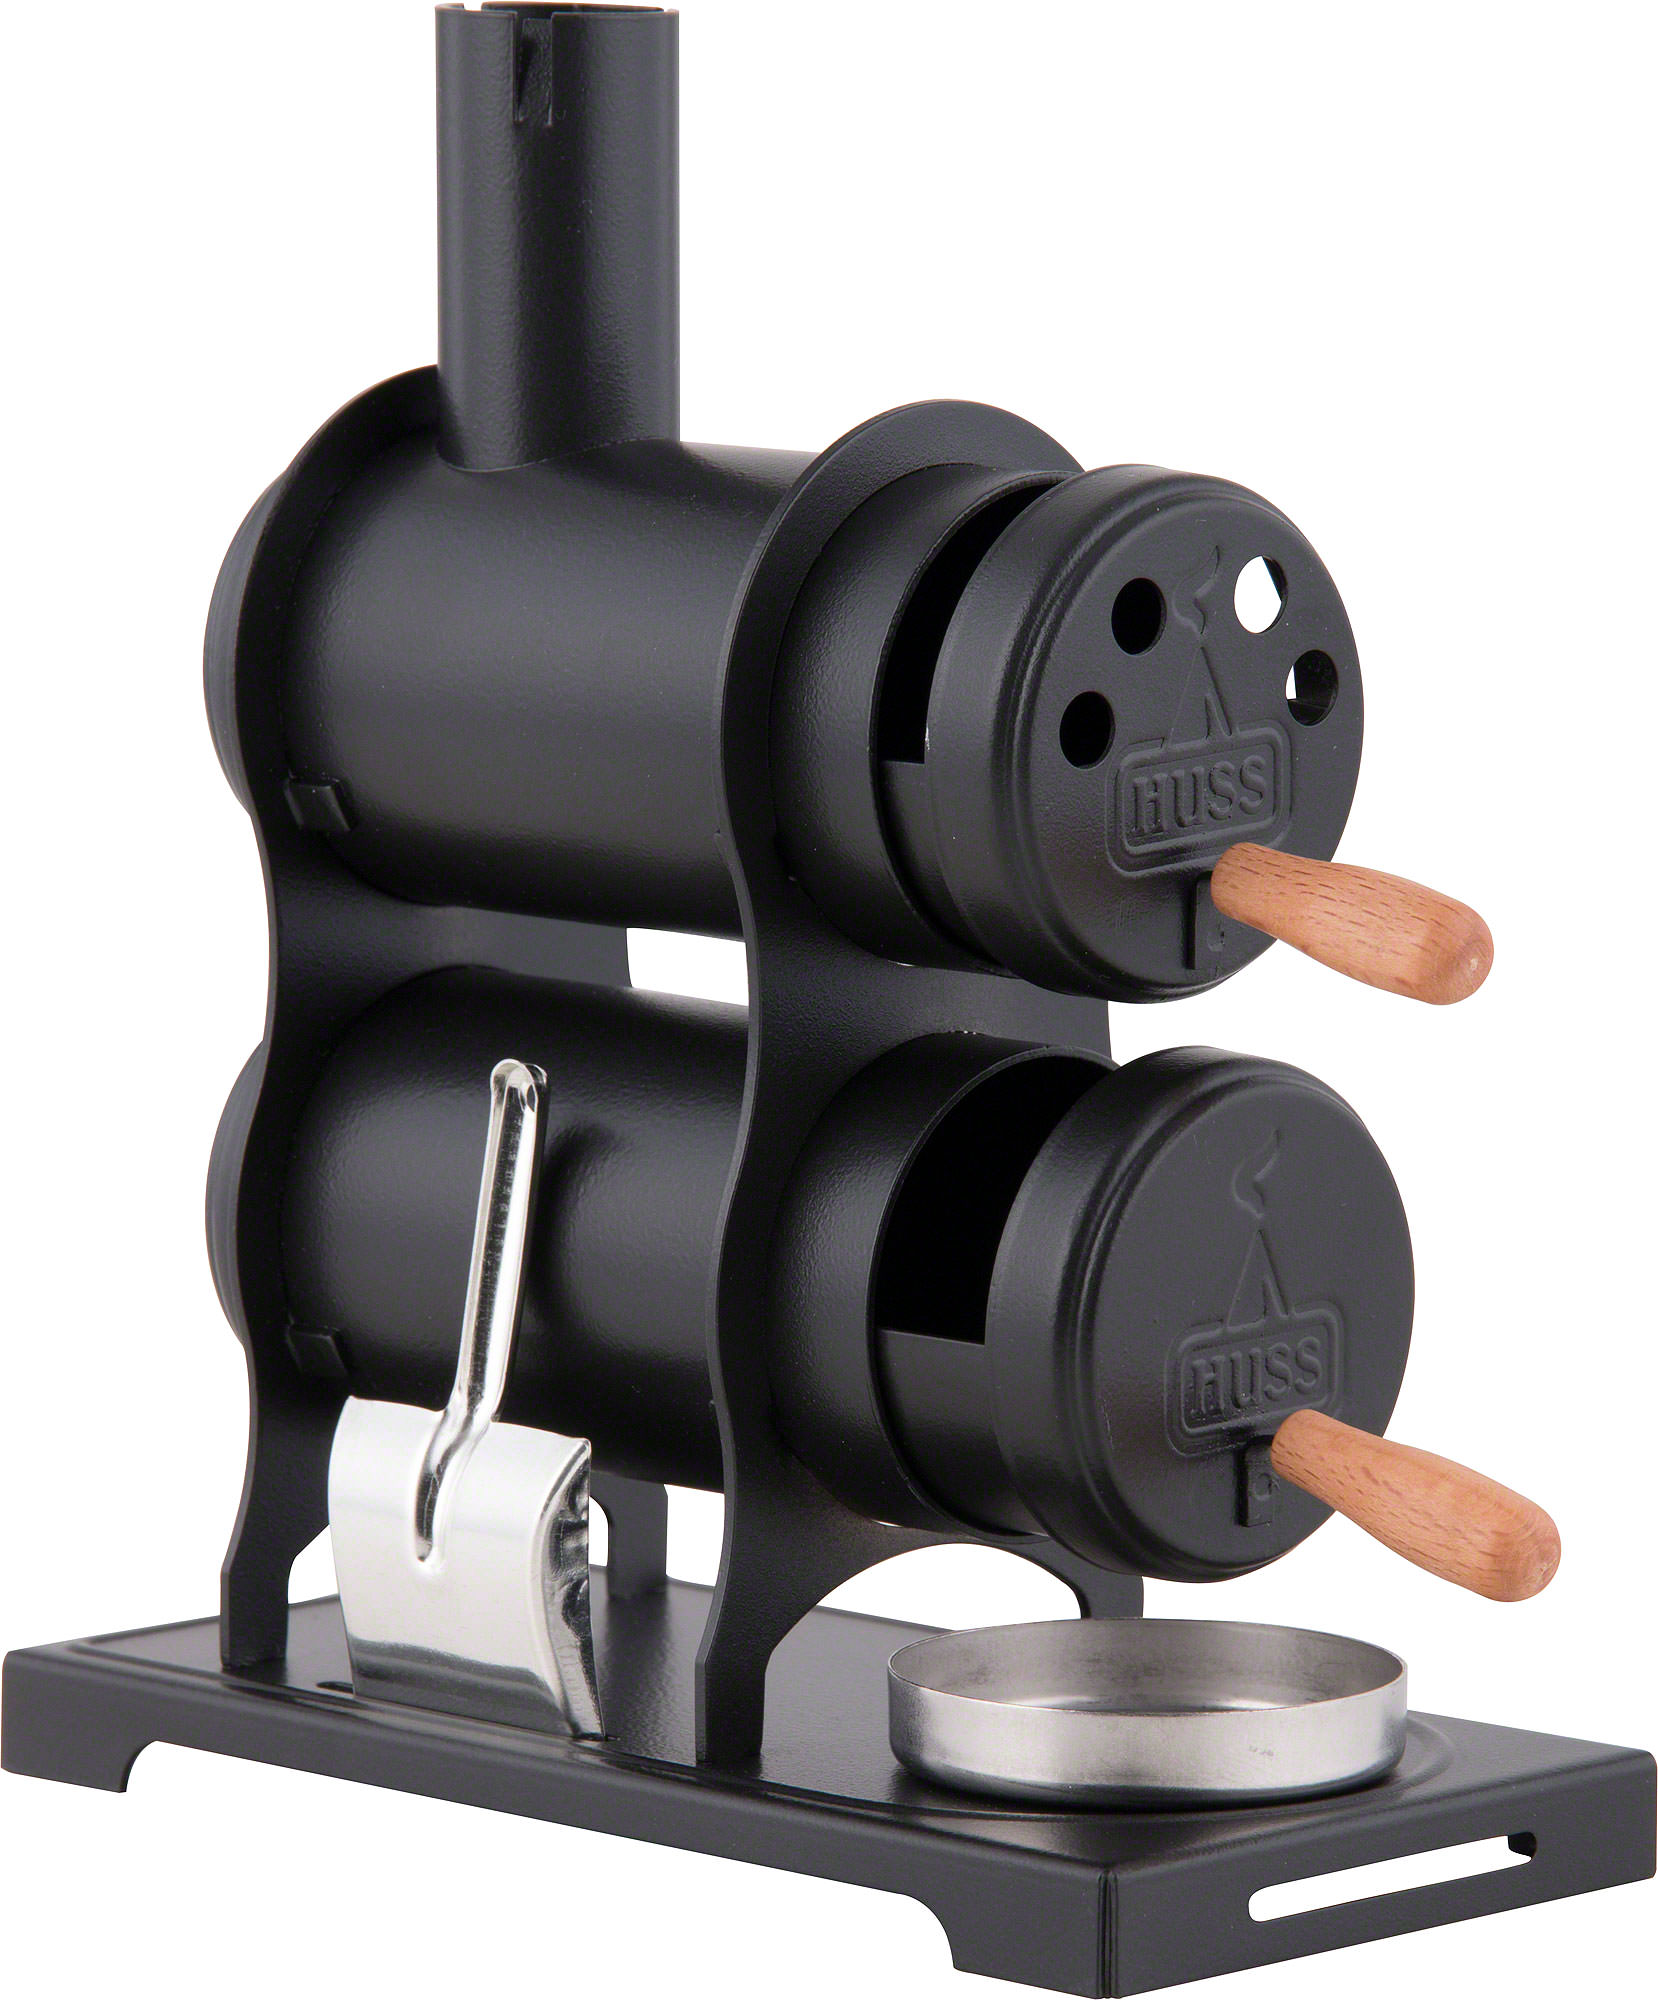 smoking stove the workshop stove black 13 5 cm by huss r ucherkerzen. Black Bedroom Furniture Sets. Home Design Ideas